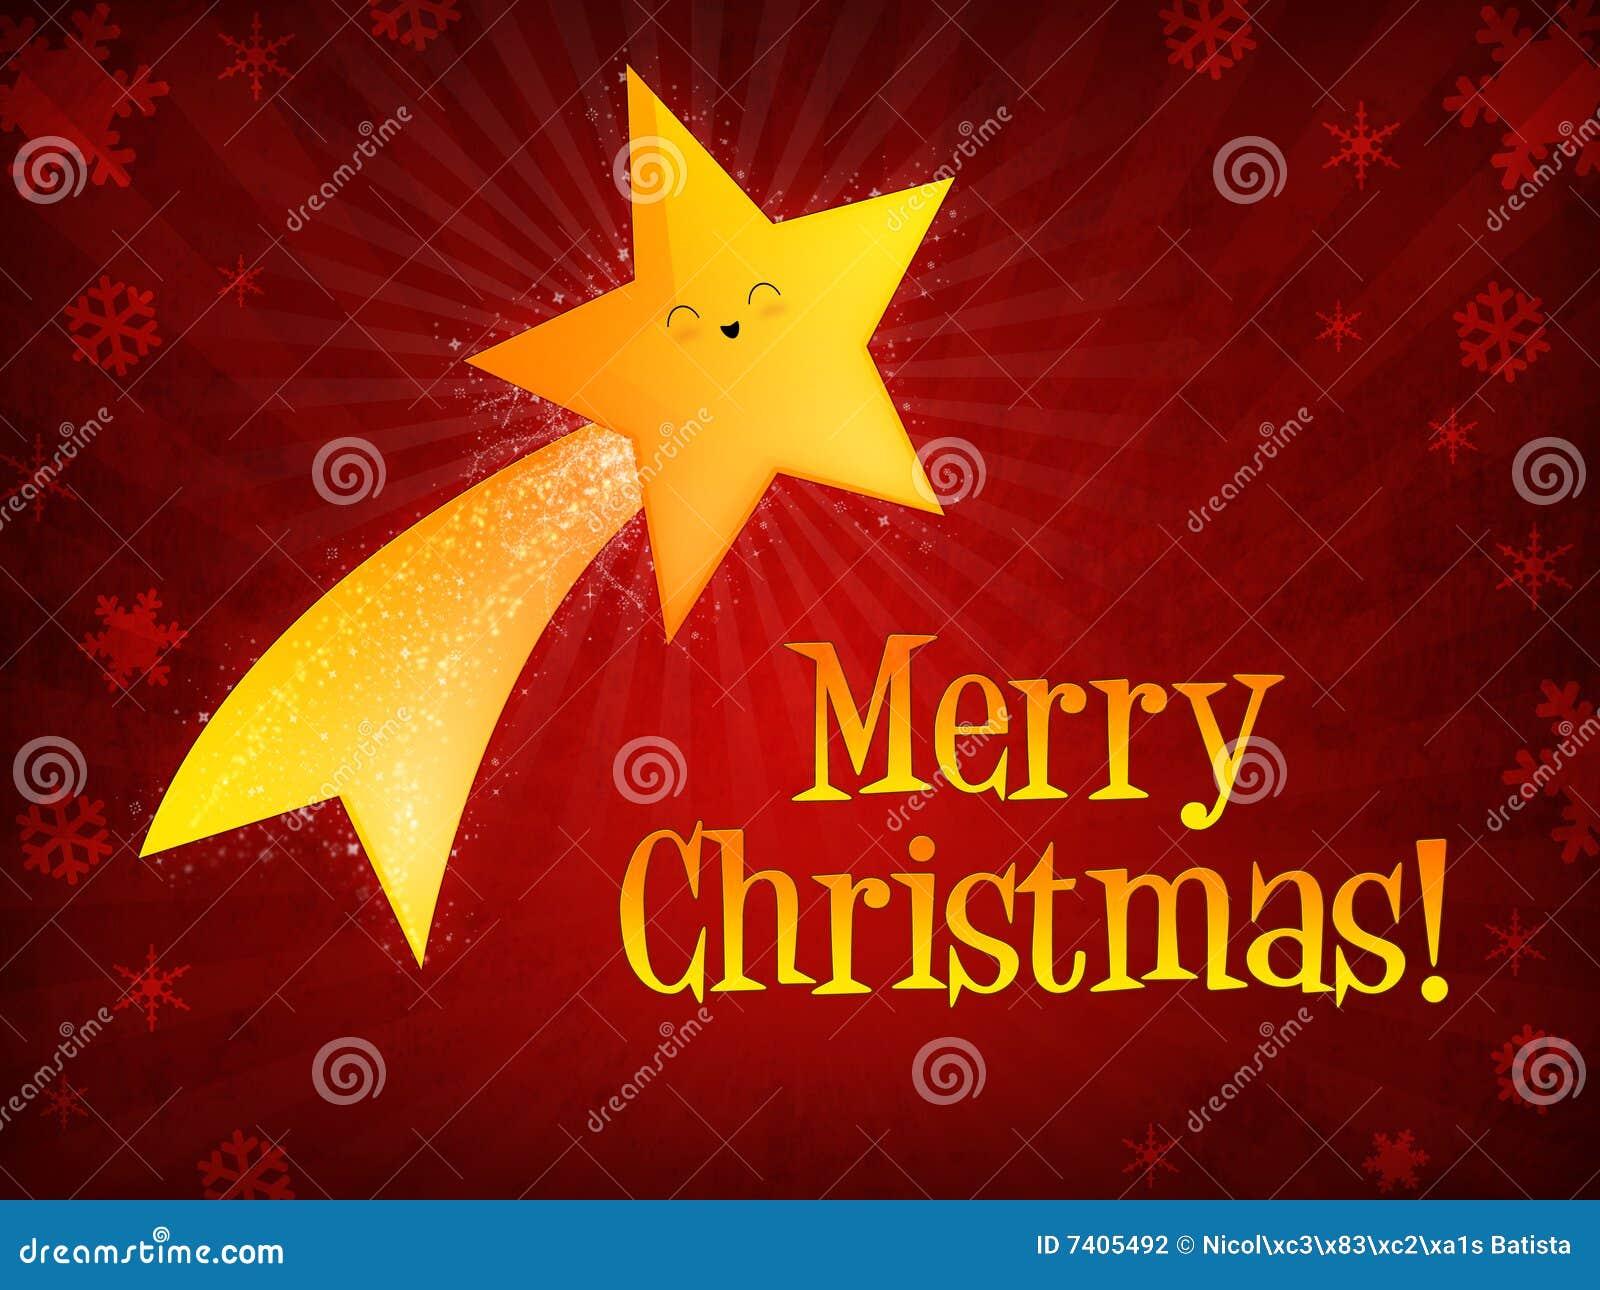 Estrella fugaz de la feliz navidad stock de ilustraci n for Estrella fugaz navidad